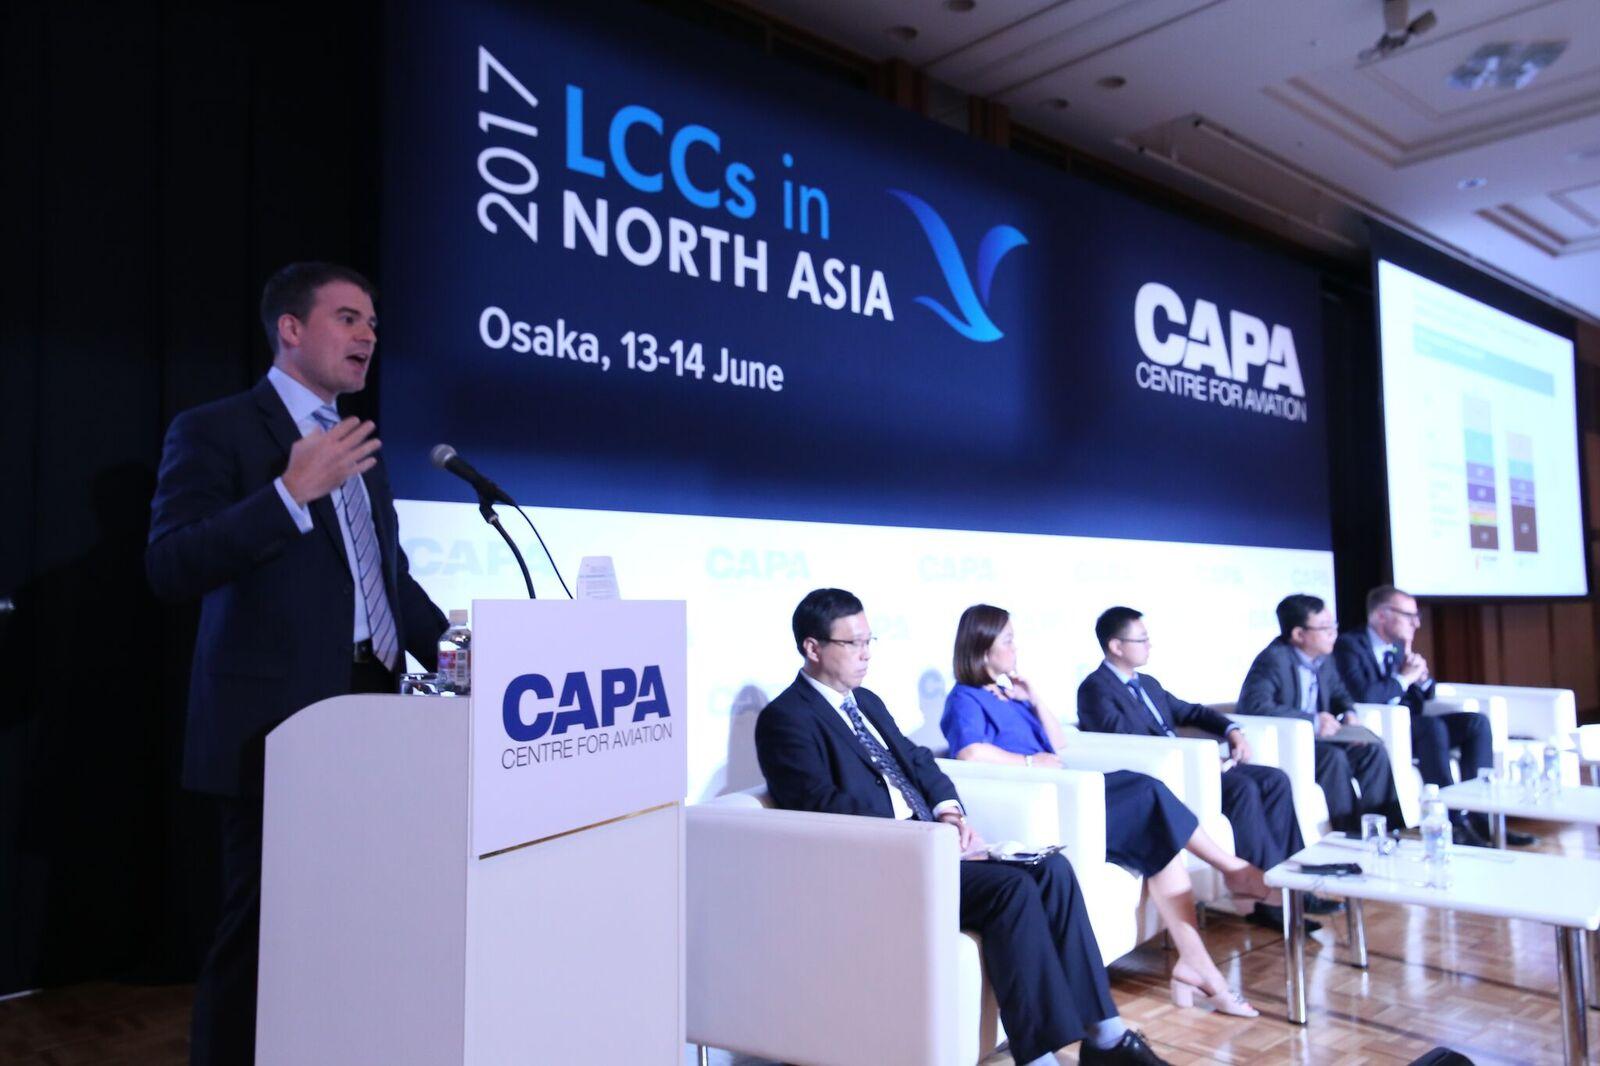 CAPA LCCs in North Asia, 11-12 June